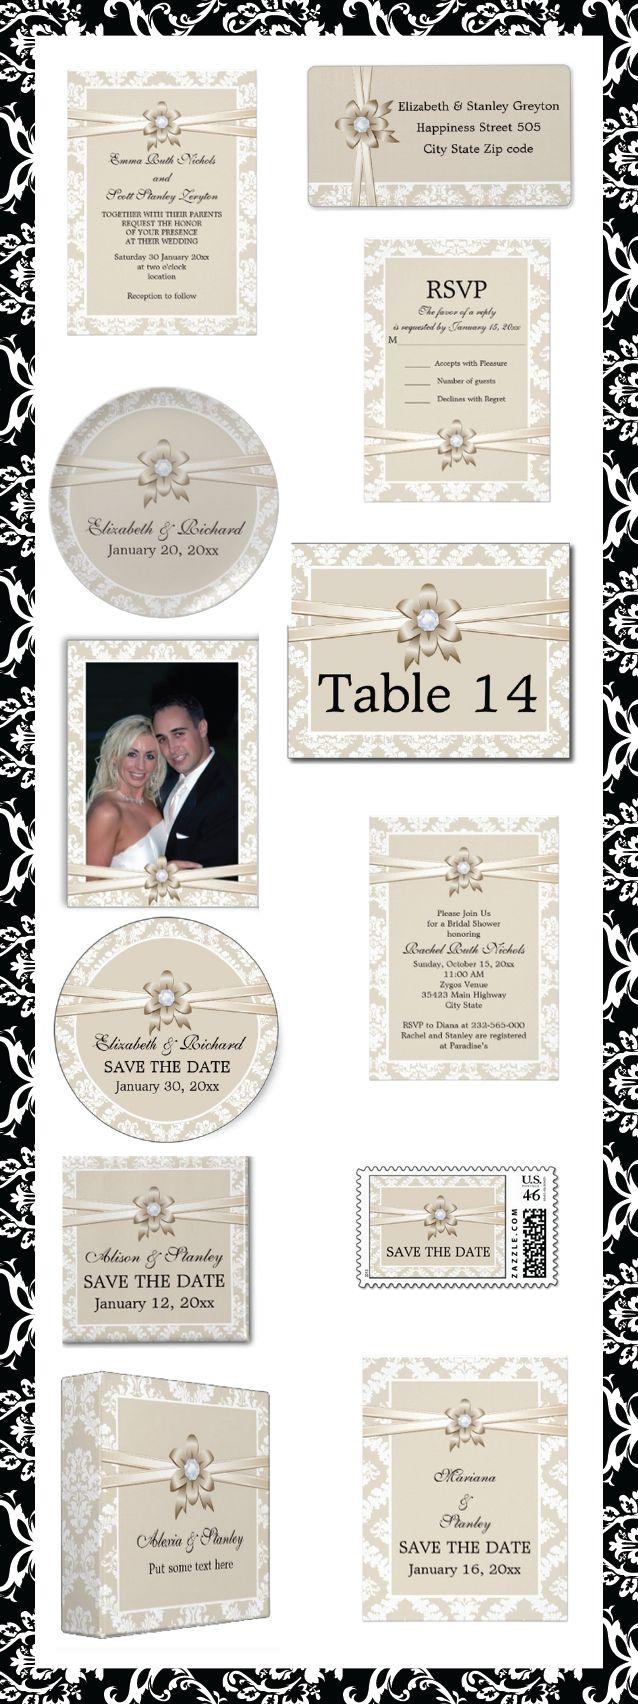 zazzle wedding invitations promo code%0A Damask border with beige ribbon and flower elegant wedding invitations and  matching stationery   damask